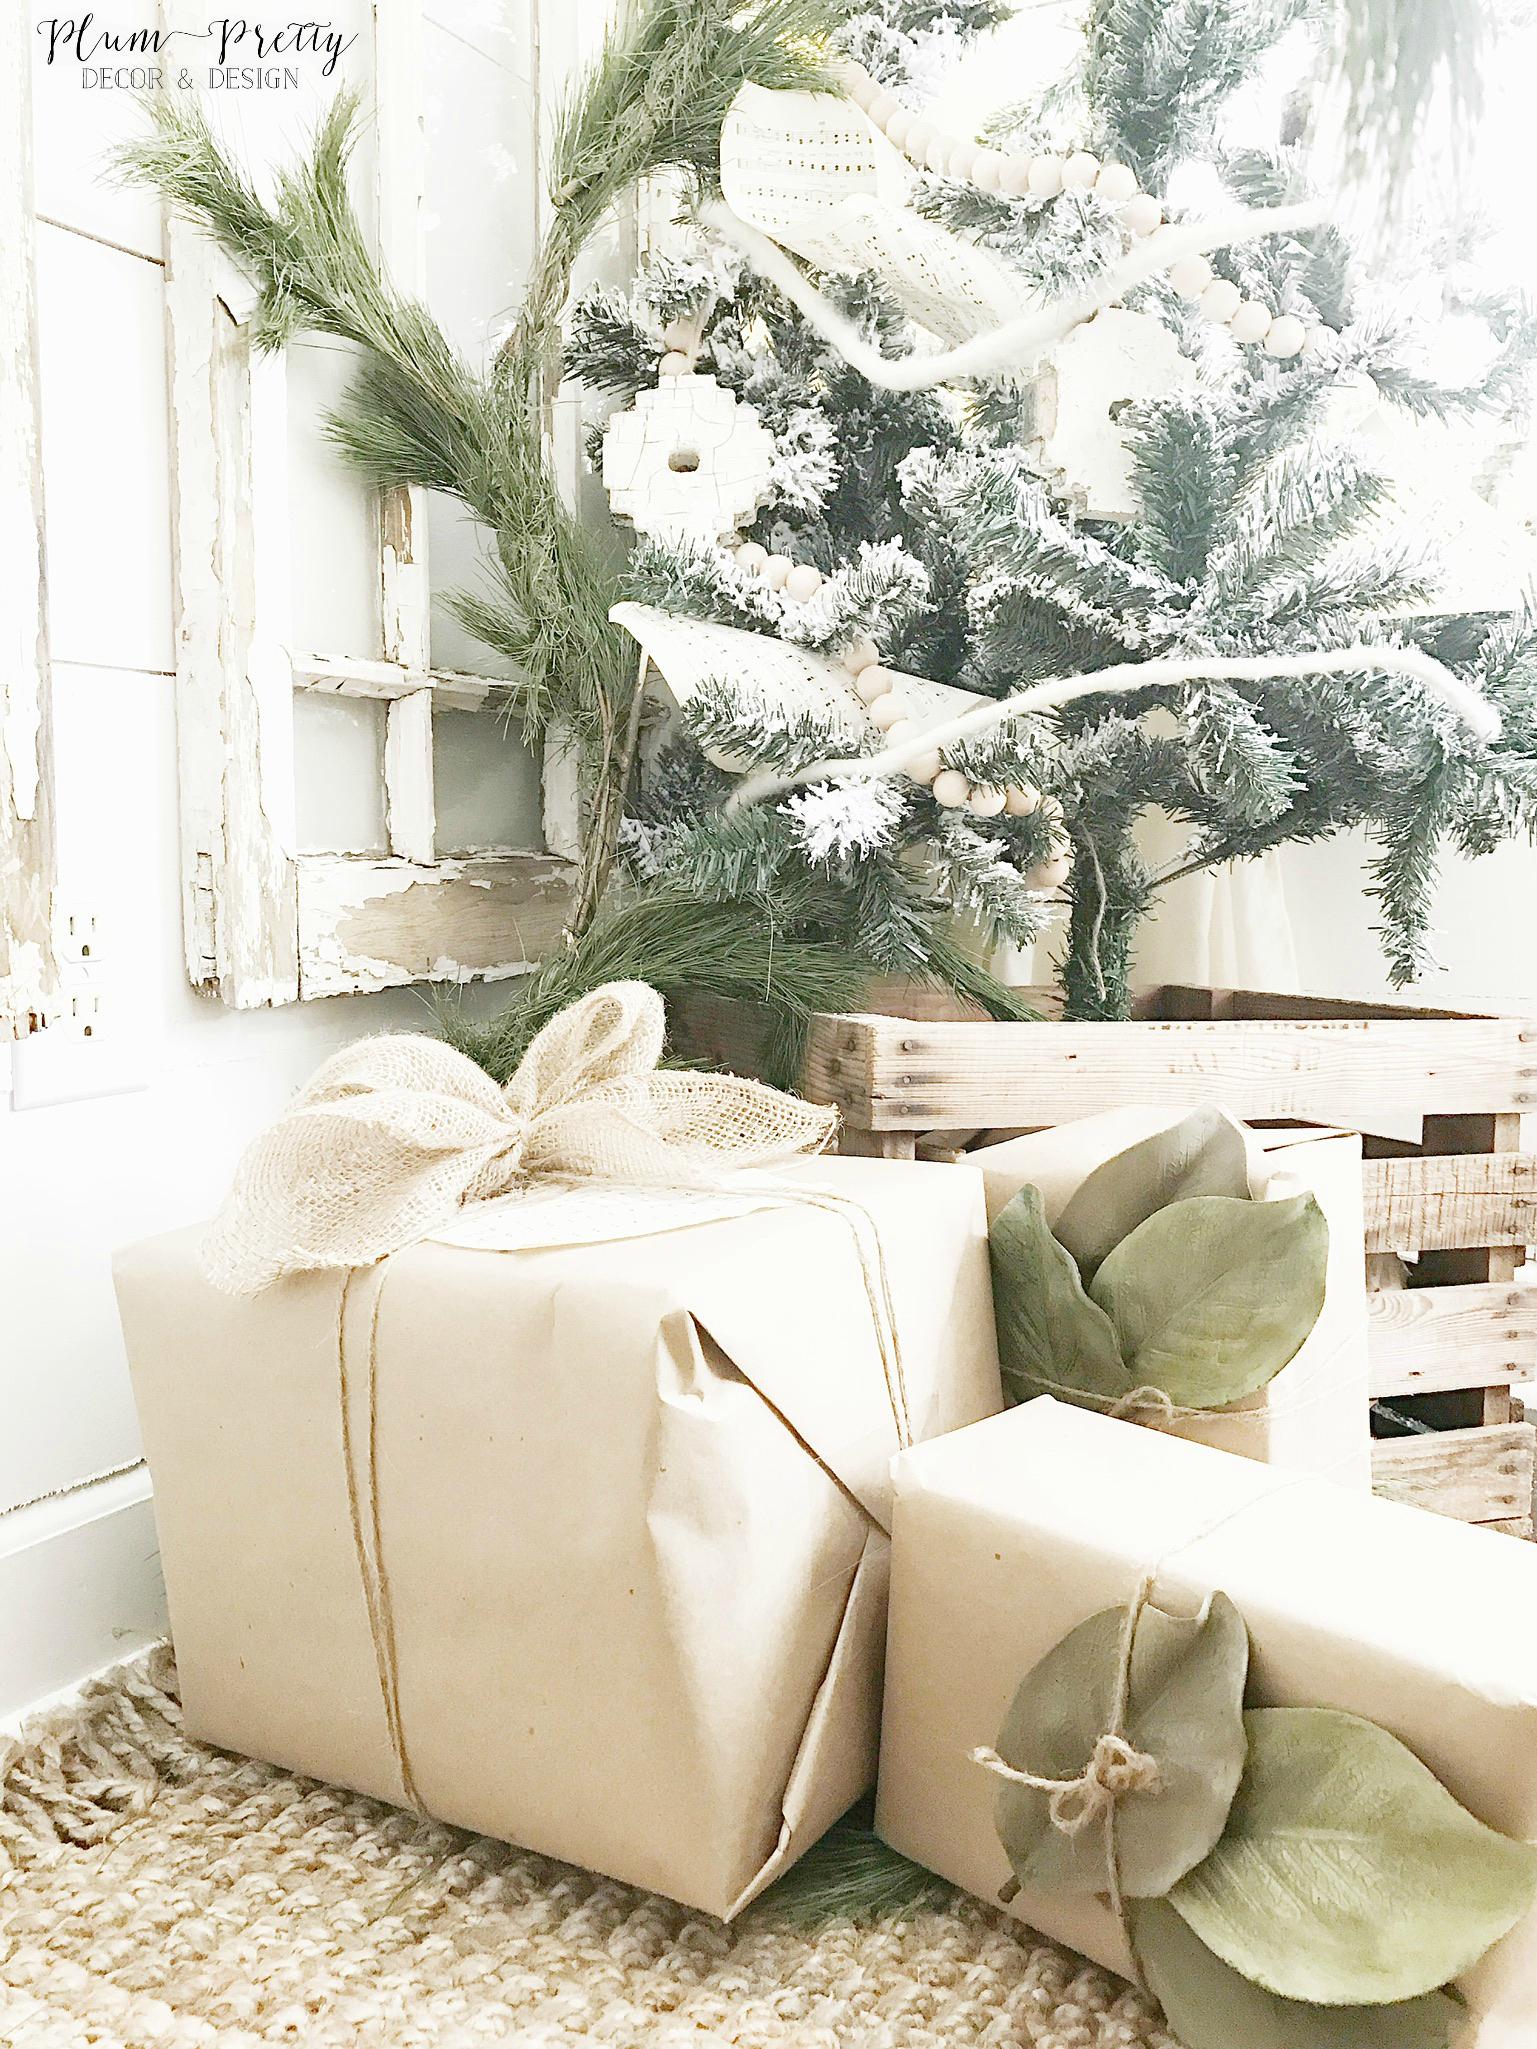 Neutral Christmas Decor in a Farmhouse Style Office- Plum Pretty Decor and Design